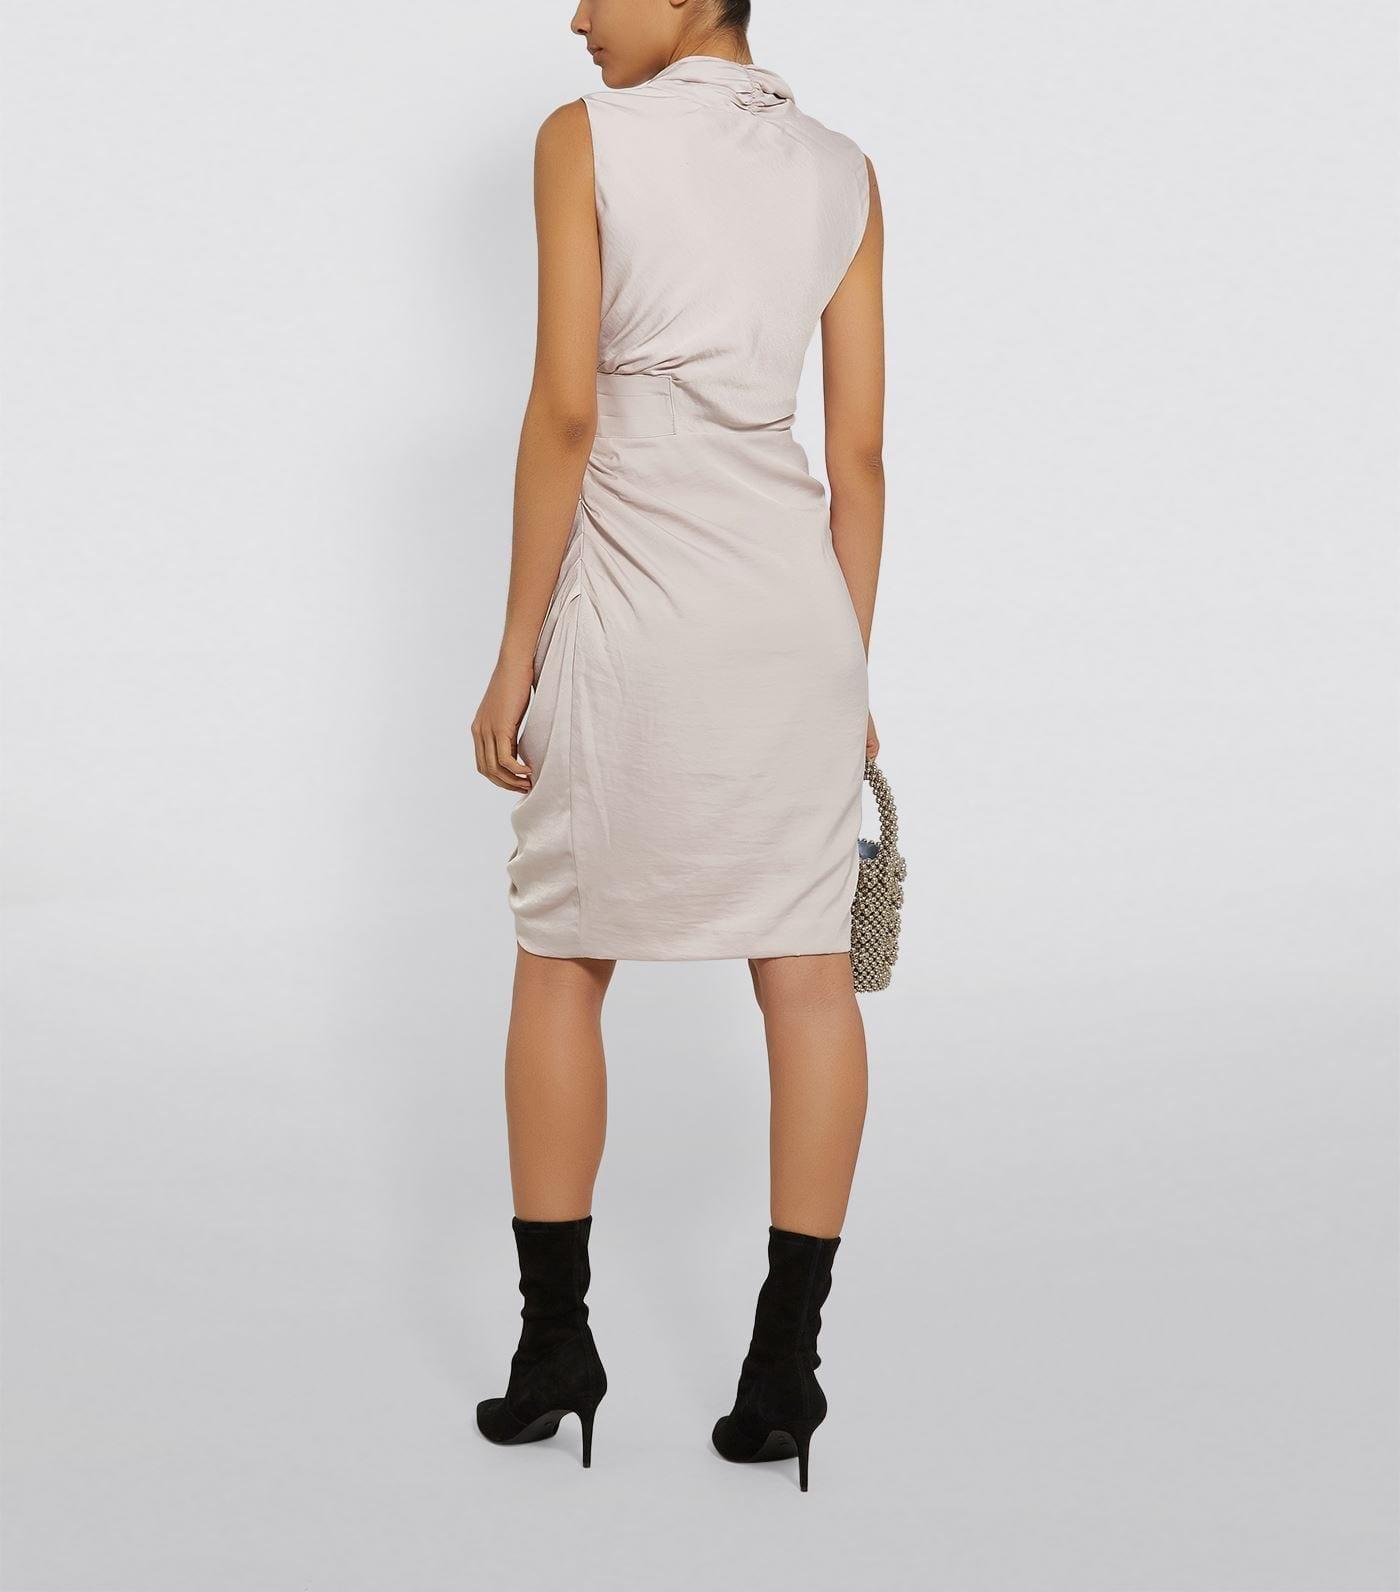 ALLSAINTS Cancity Draped Dress